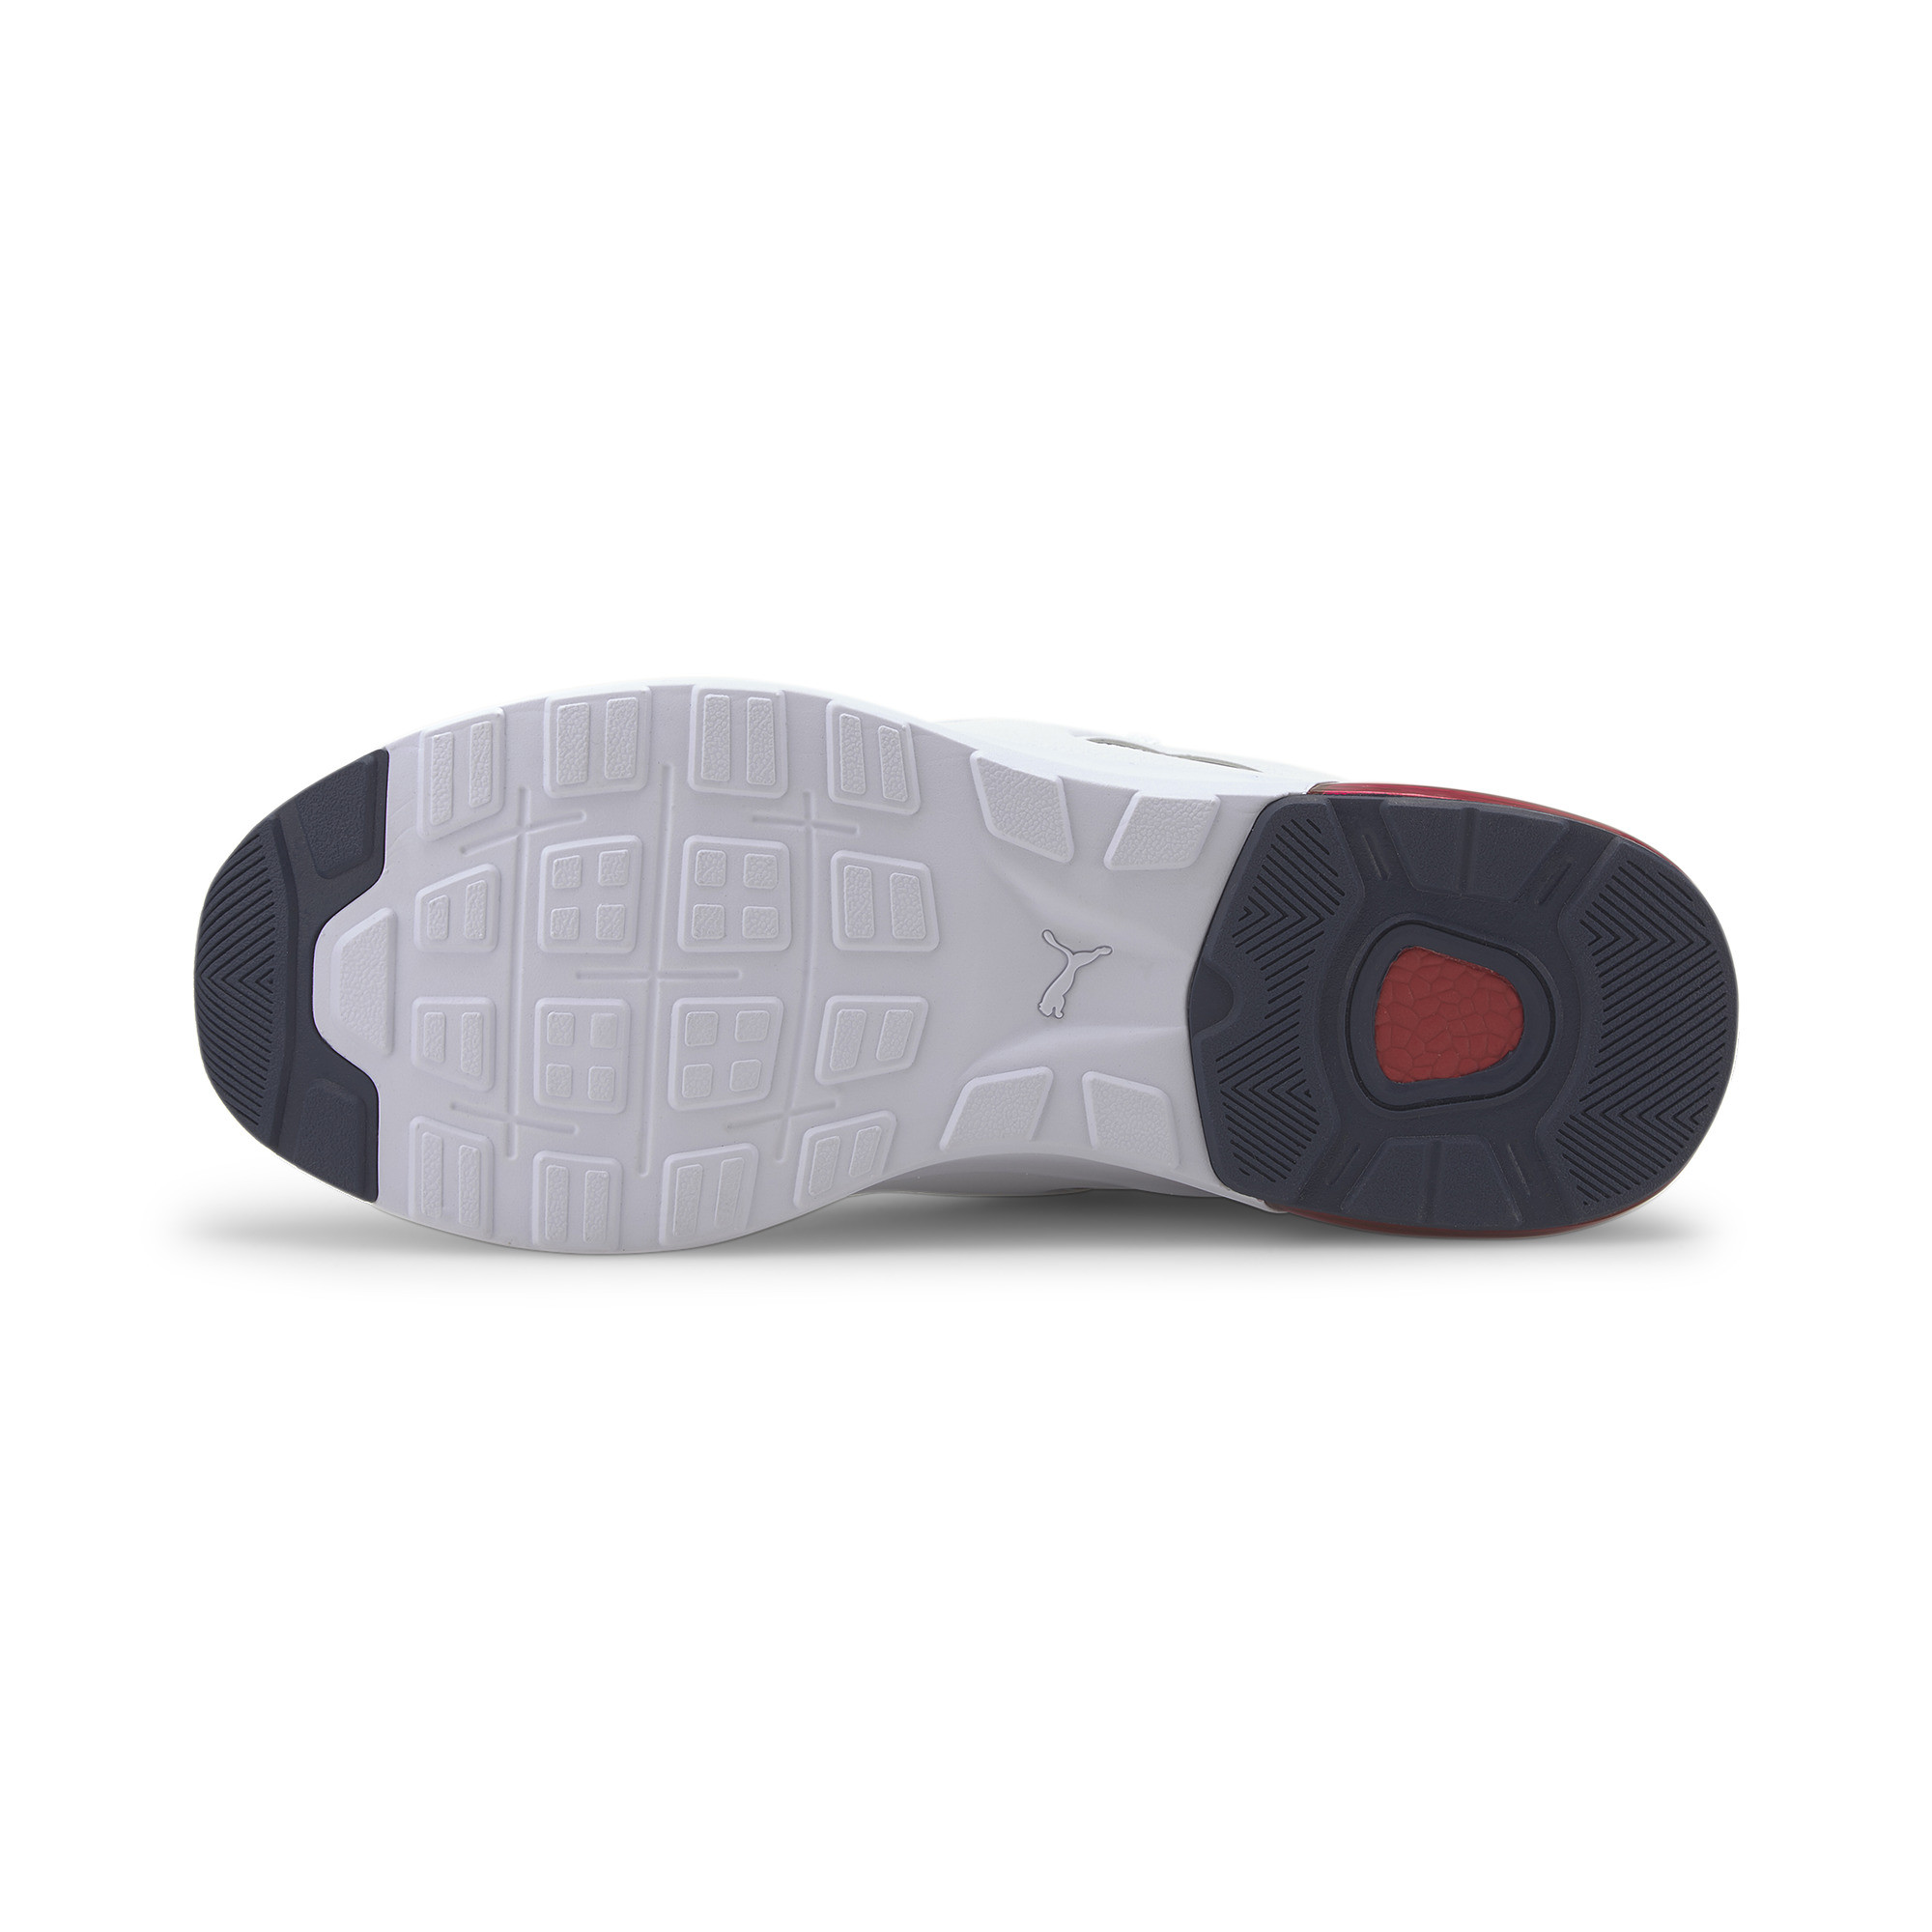 PUMA-Electron-Street-Men-039-s-Sneakers-Men-Shoe-Basics thumbnail 18